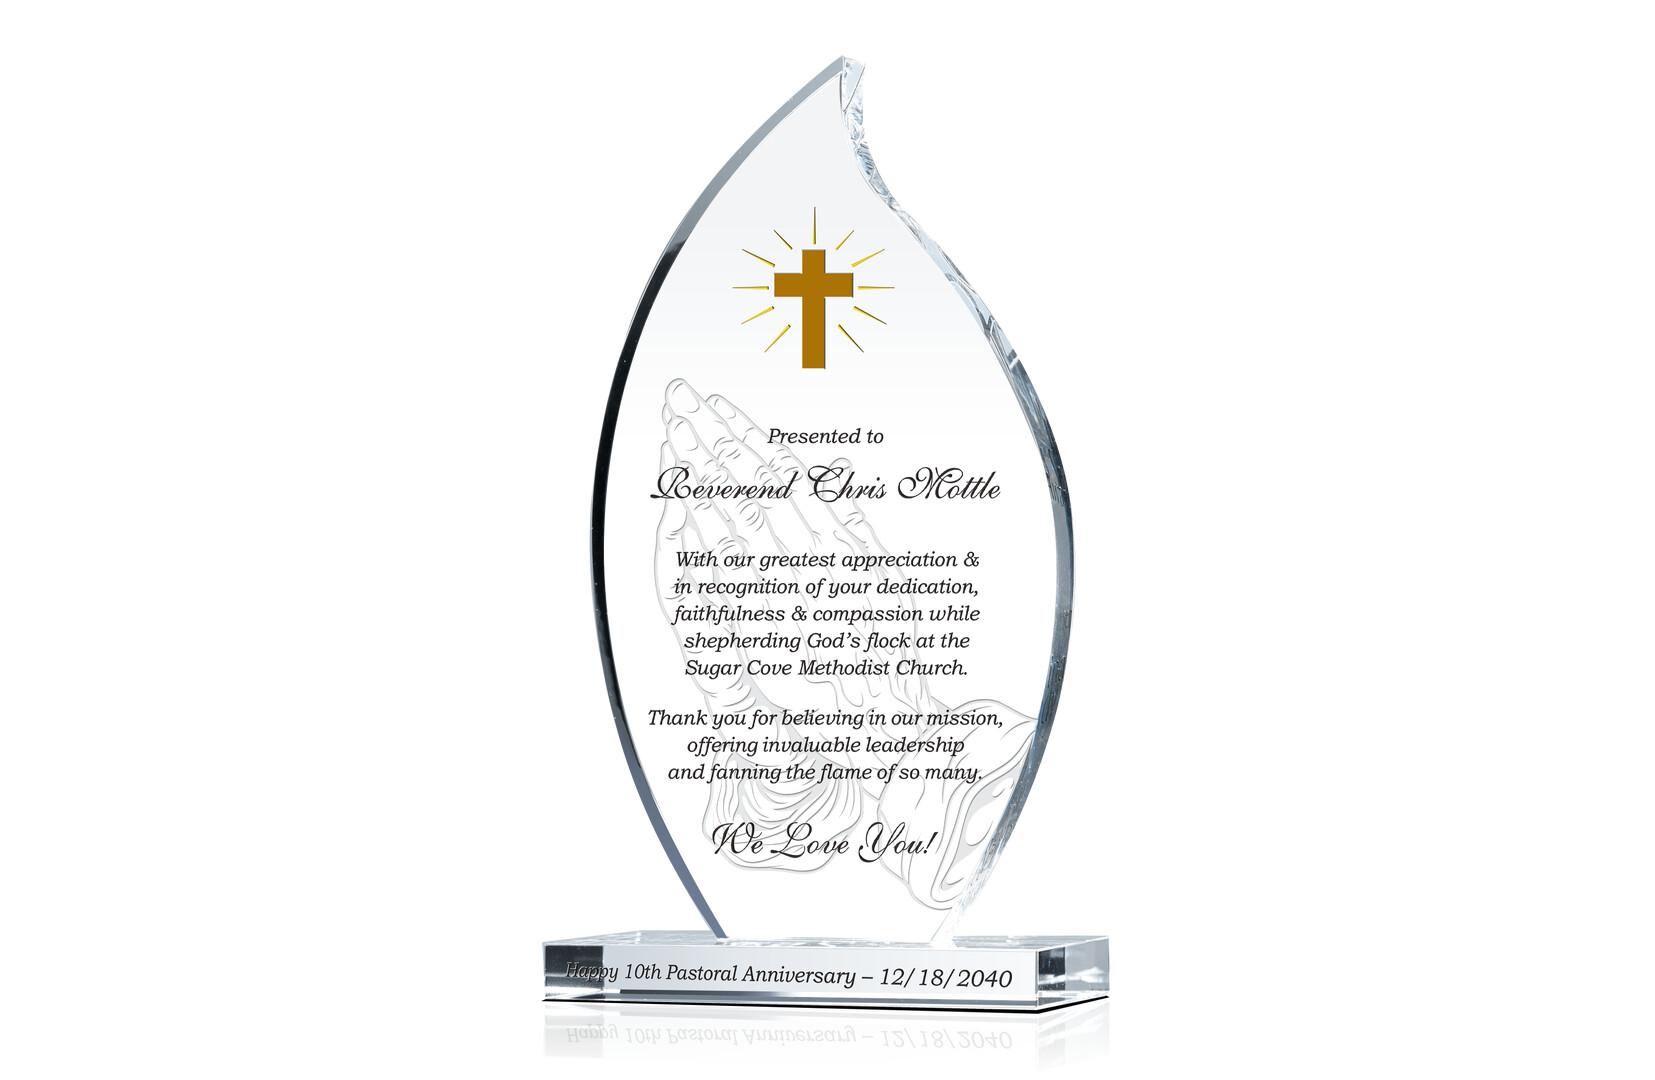 Pastor 10th Anniversary Appreciation Gift